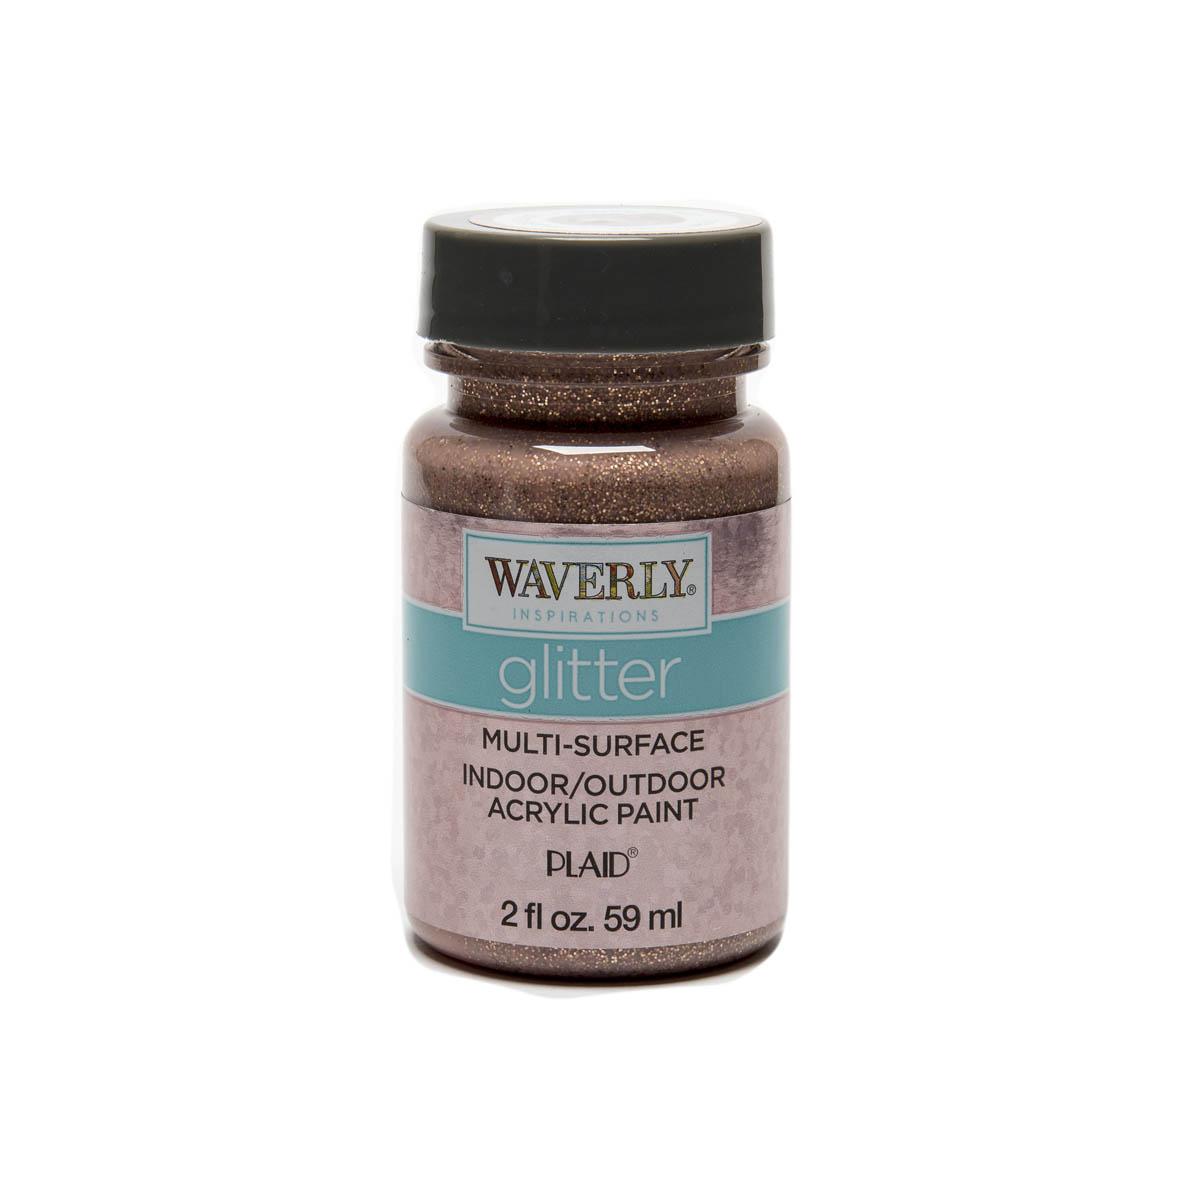 Waverly ® Inspirations Glitter Multi-Surface Acrylic Paint - Rose Gold, 2 oz. - 60938E